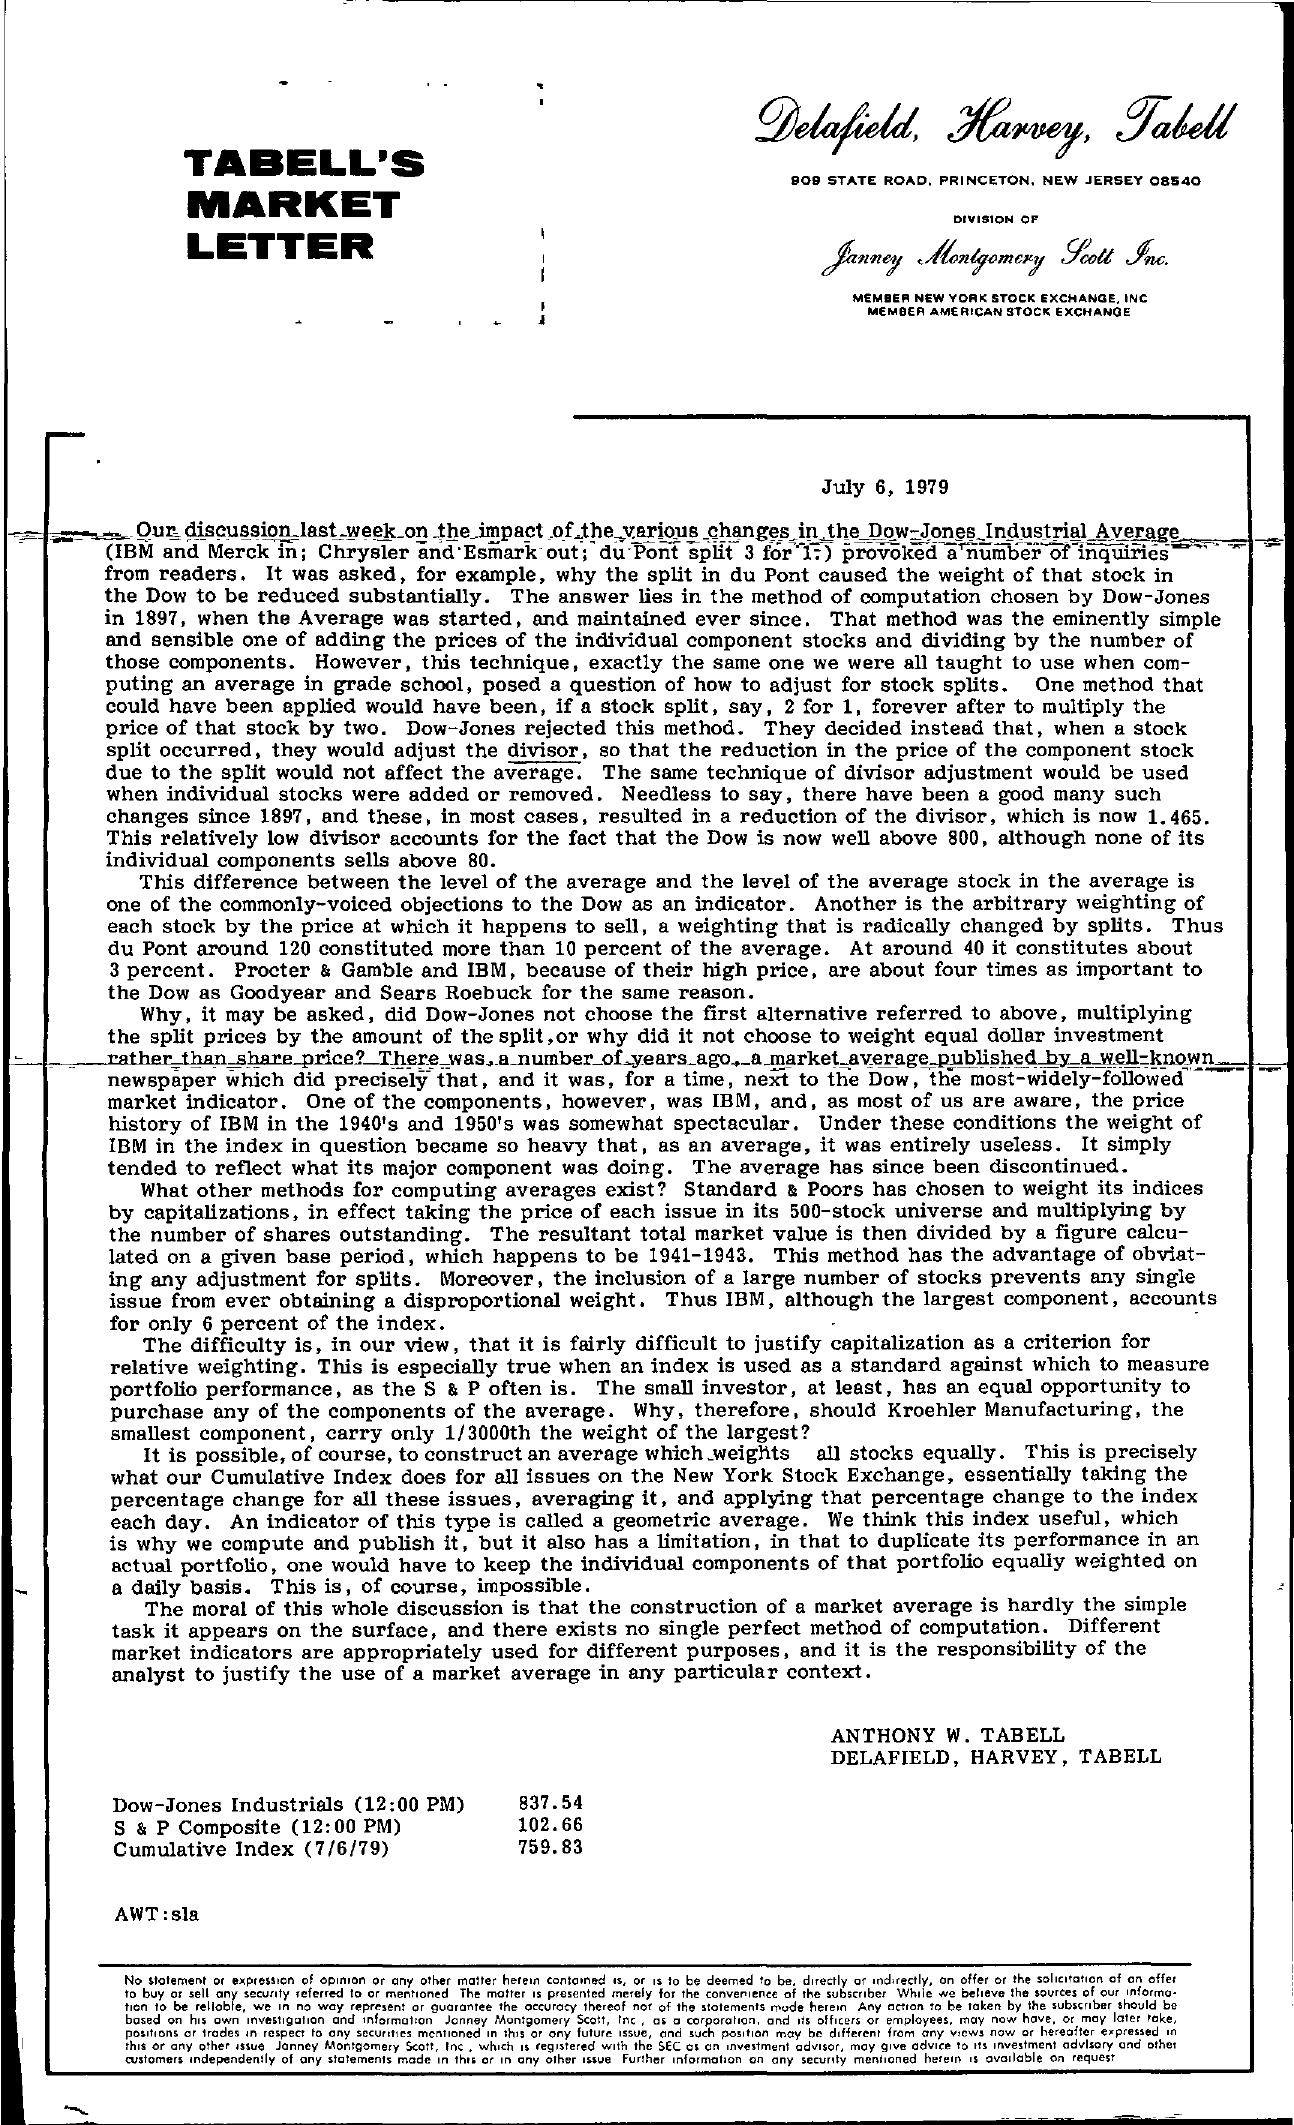 Tabell's Market Letter - July 06, 1979